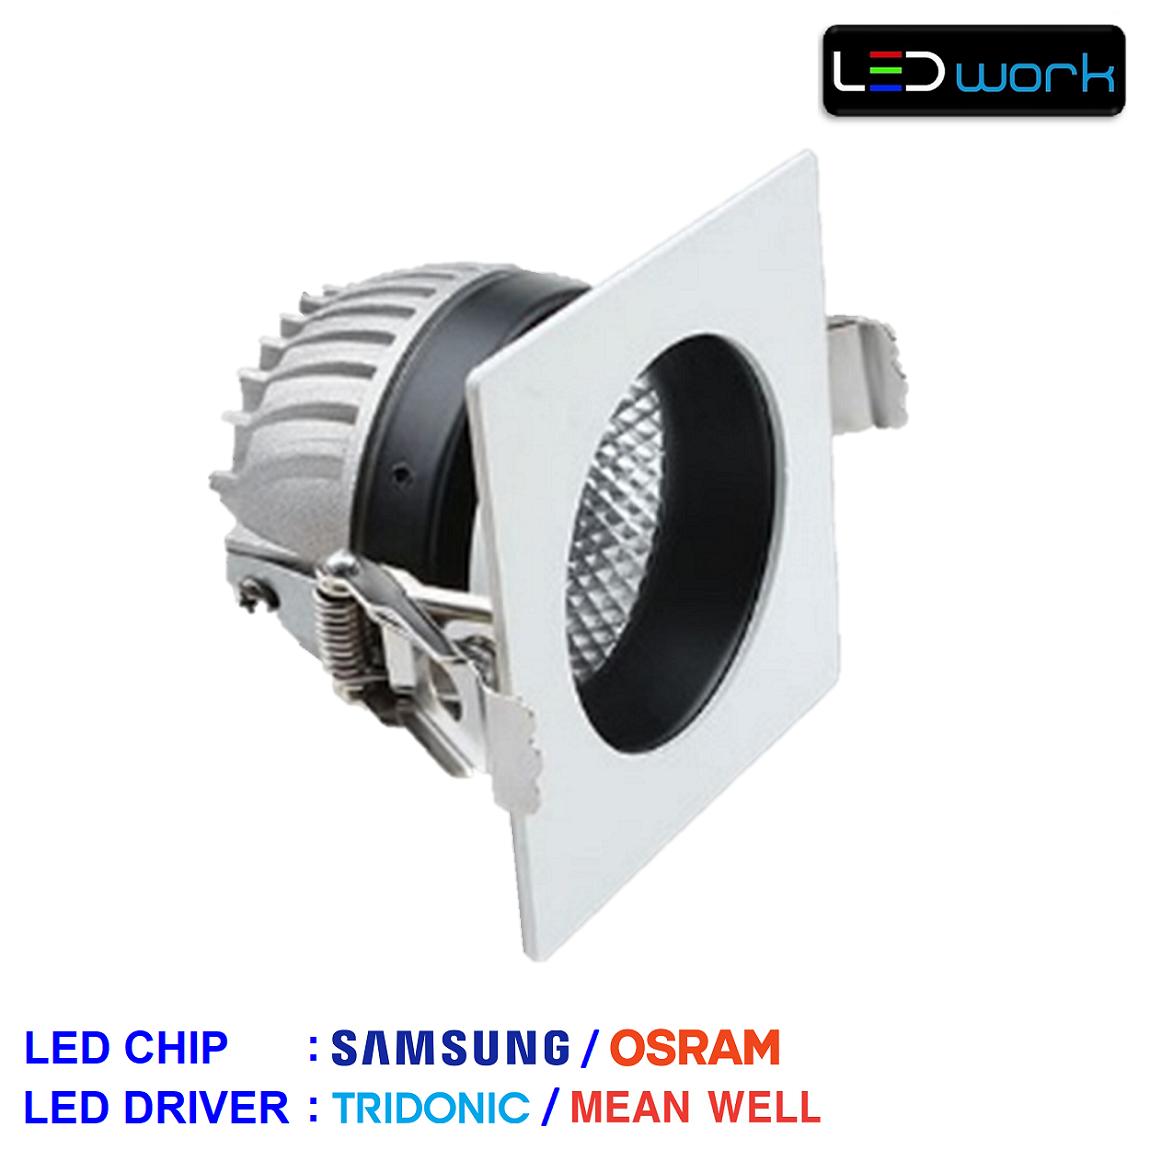 LW-Sinus-002 - 23 Watt Sıva Altı LED Mağaza Spotu